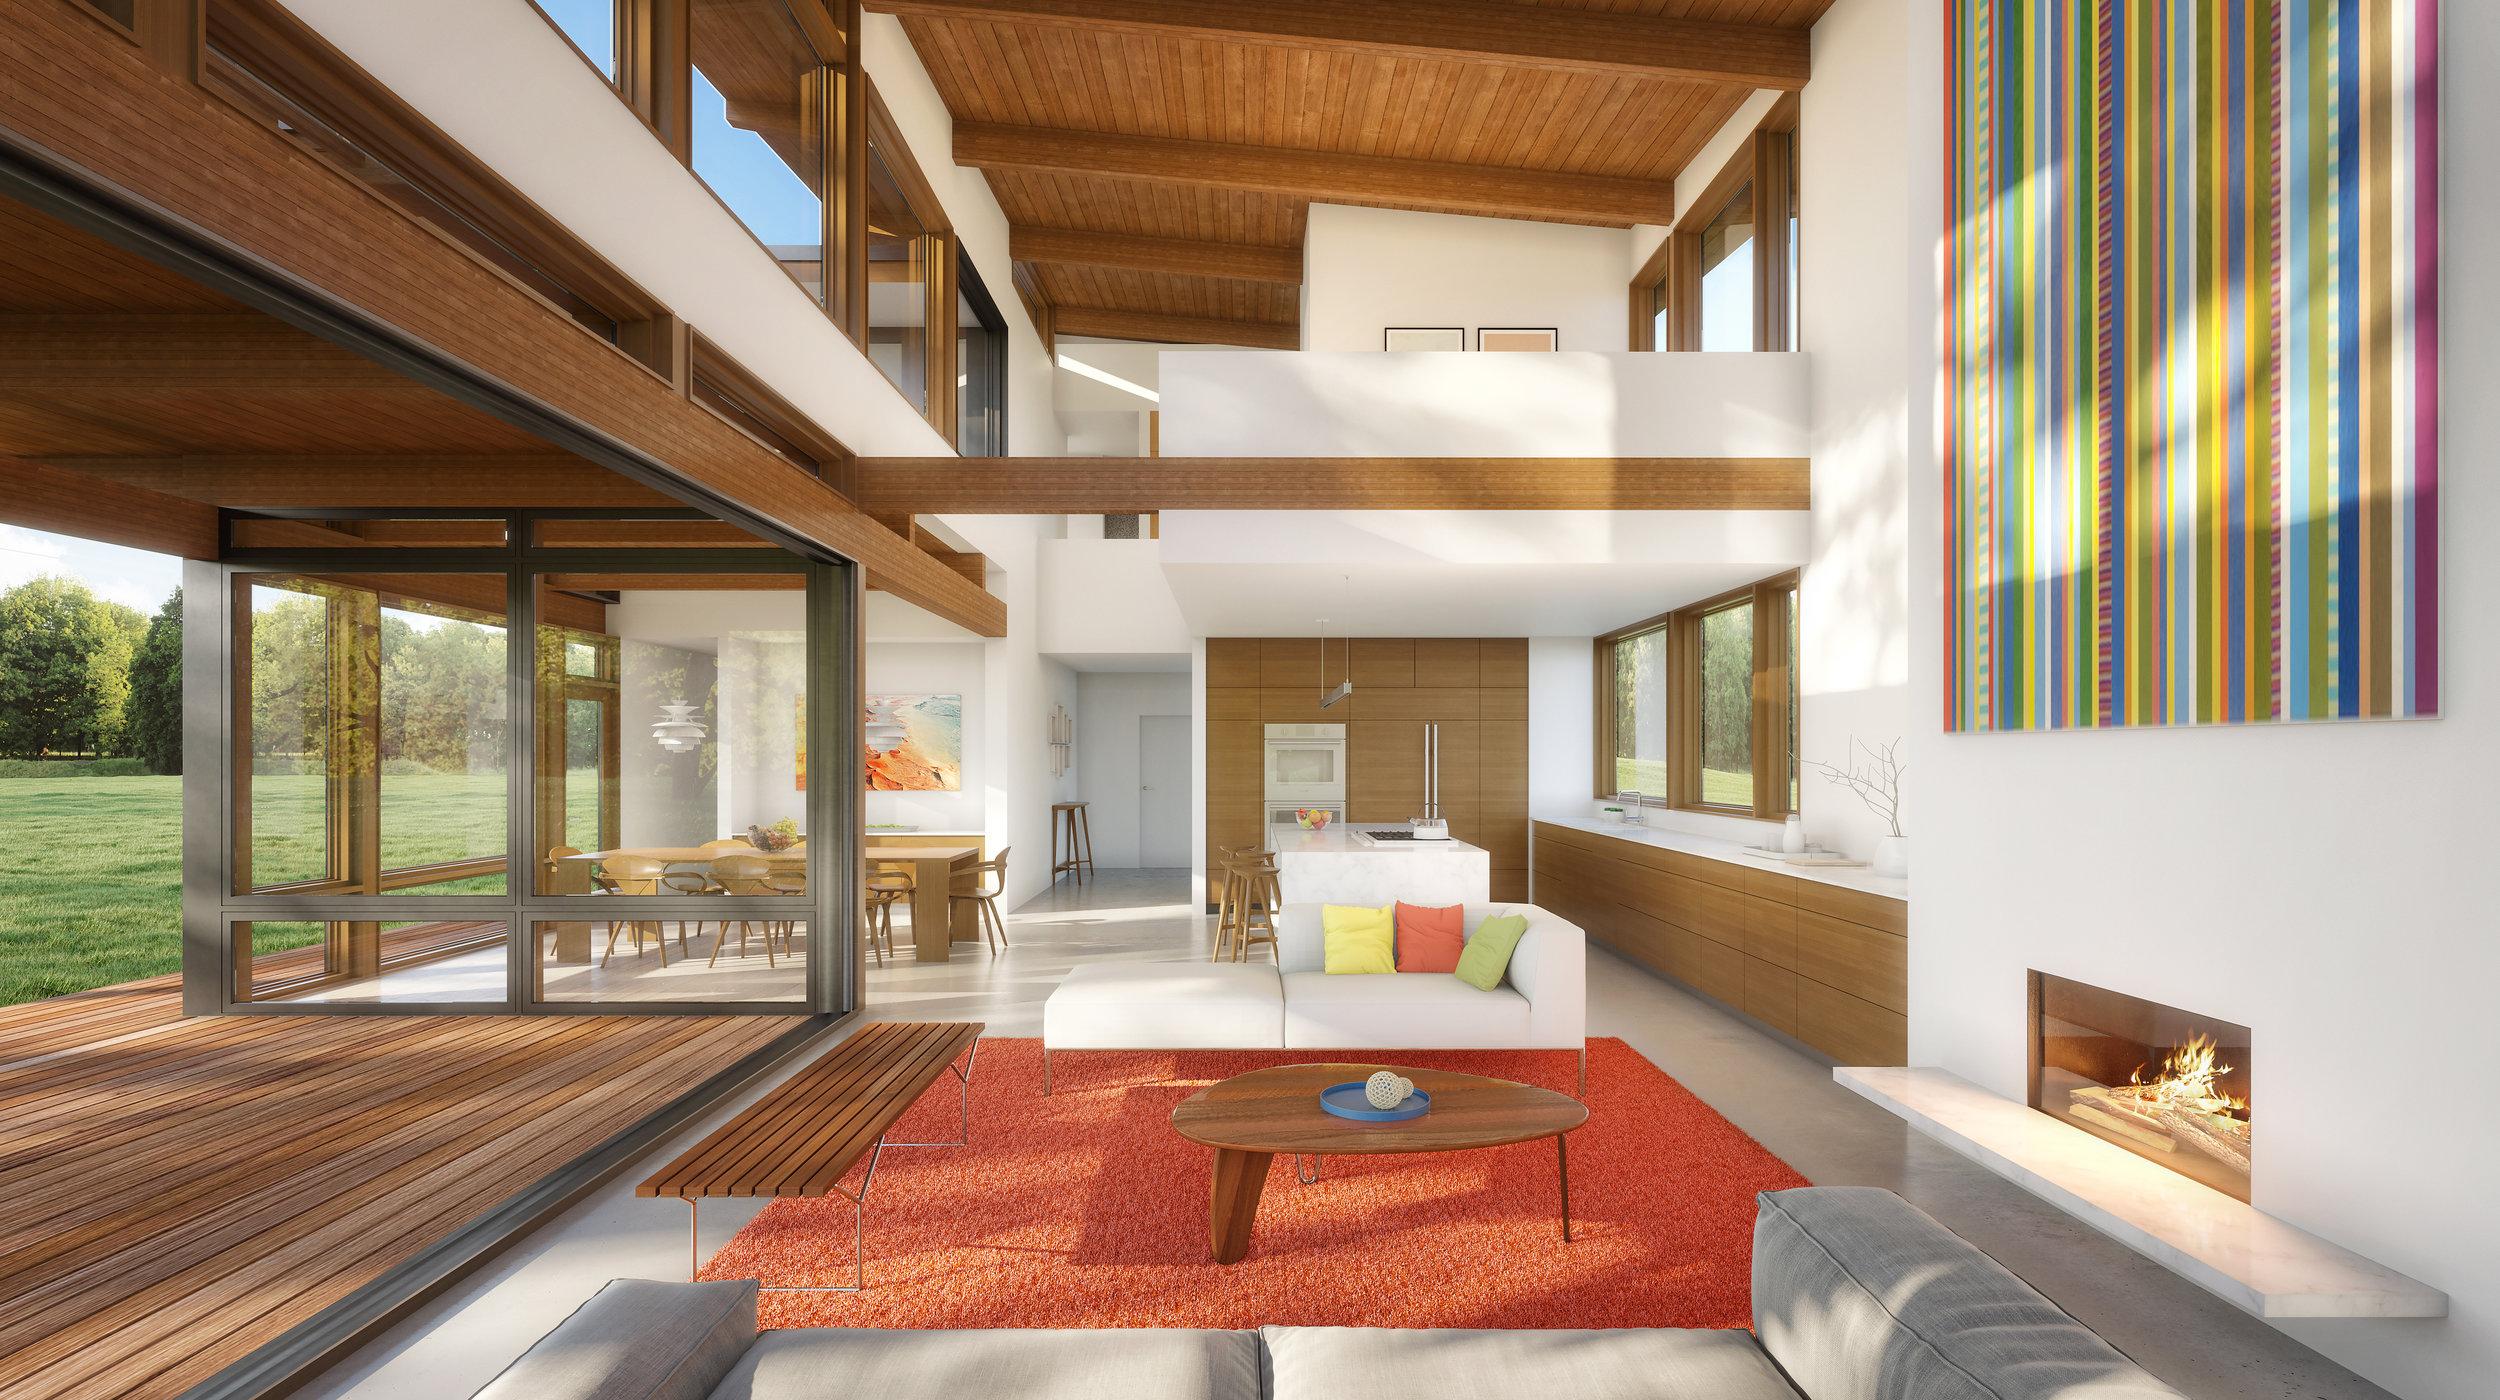 turkel_design_modern_prefab_home_axiom_series_rendering_axiom2350_interior.jpg